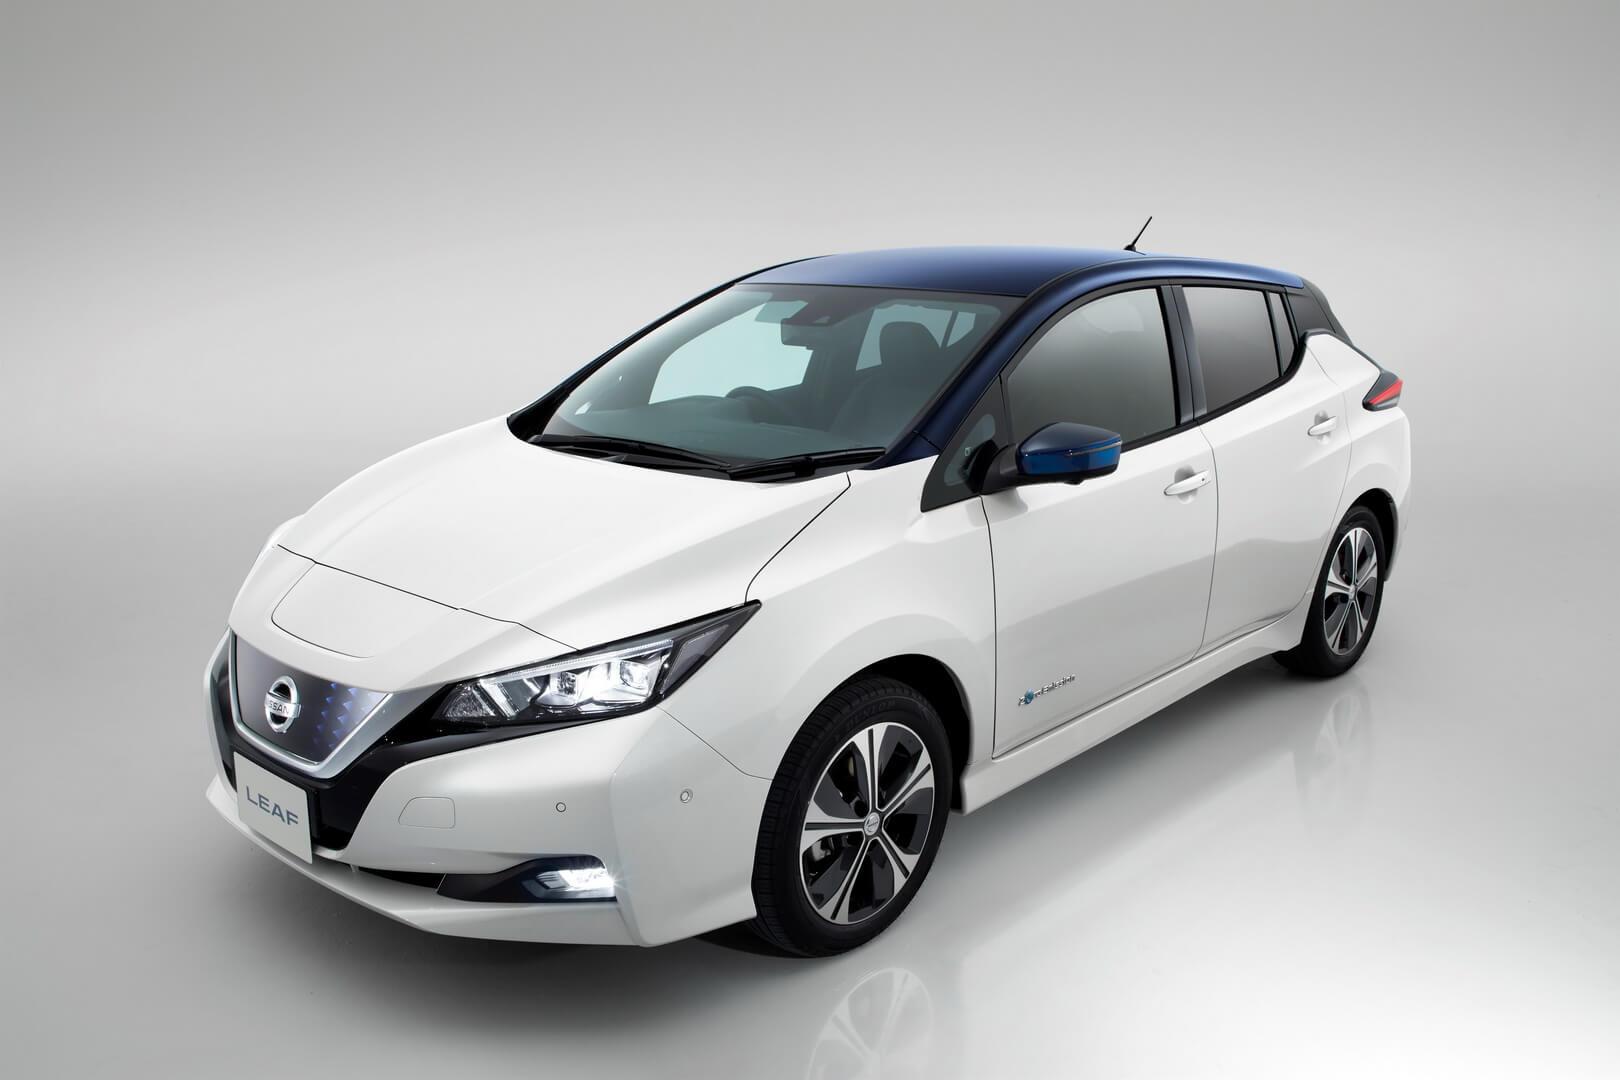 Фотография экоавто Nissan Leaf 2018 (60 кВт•ч) - фото 8